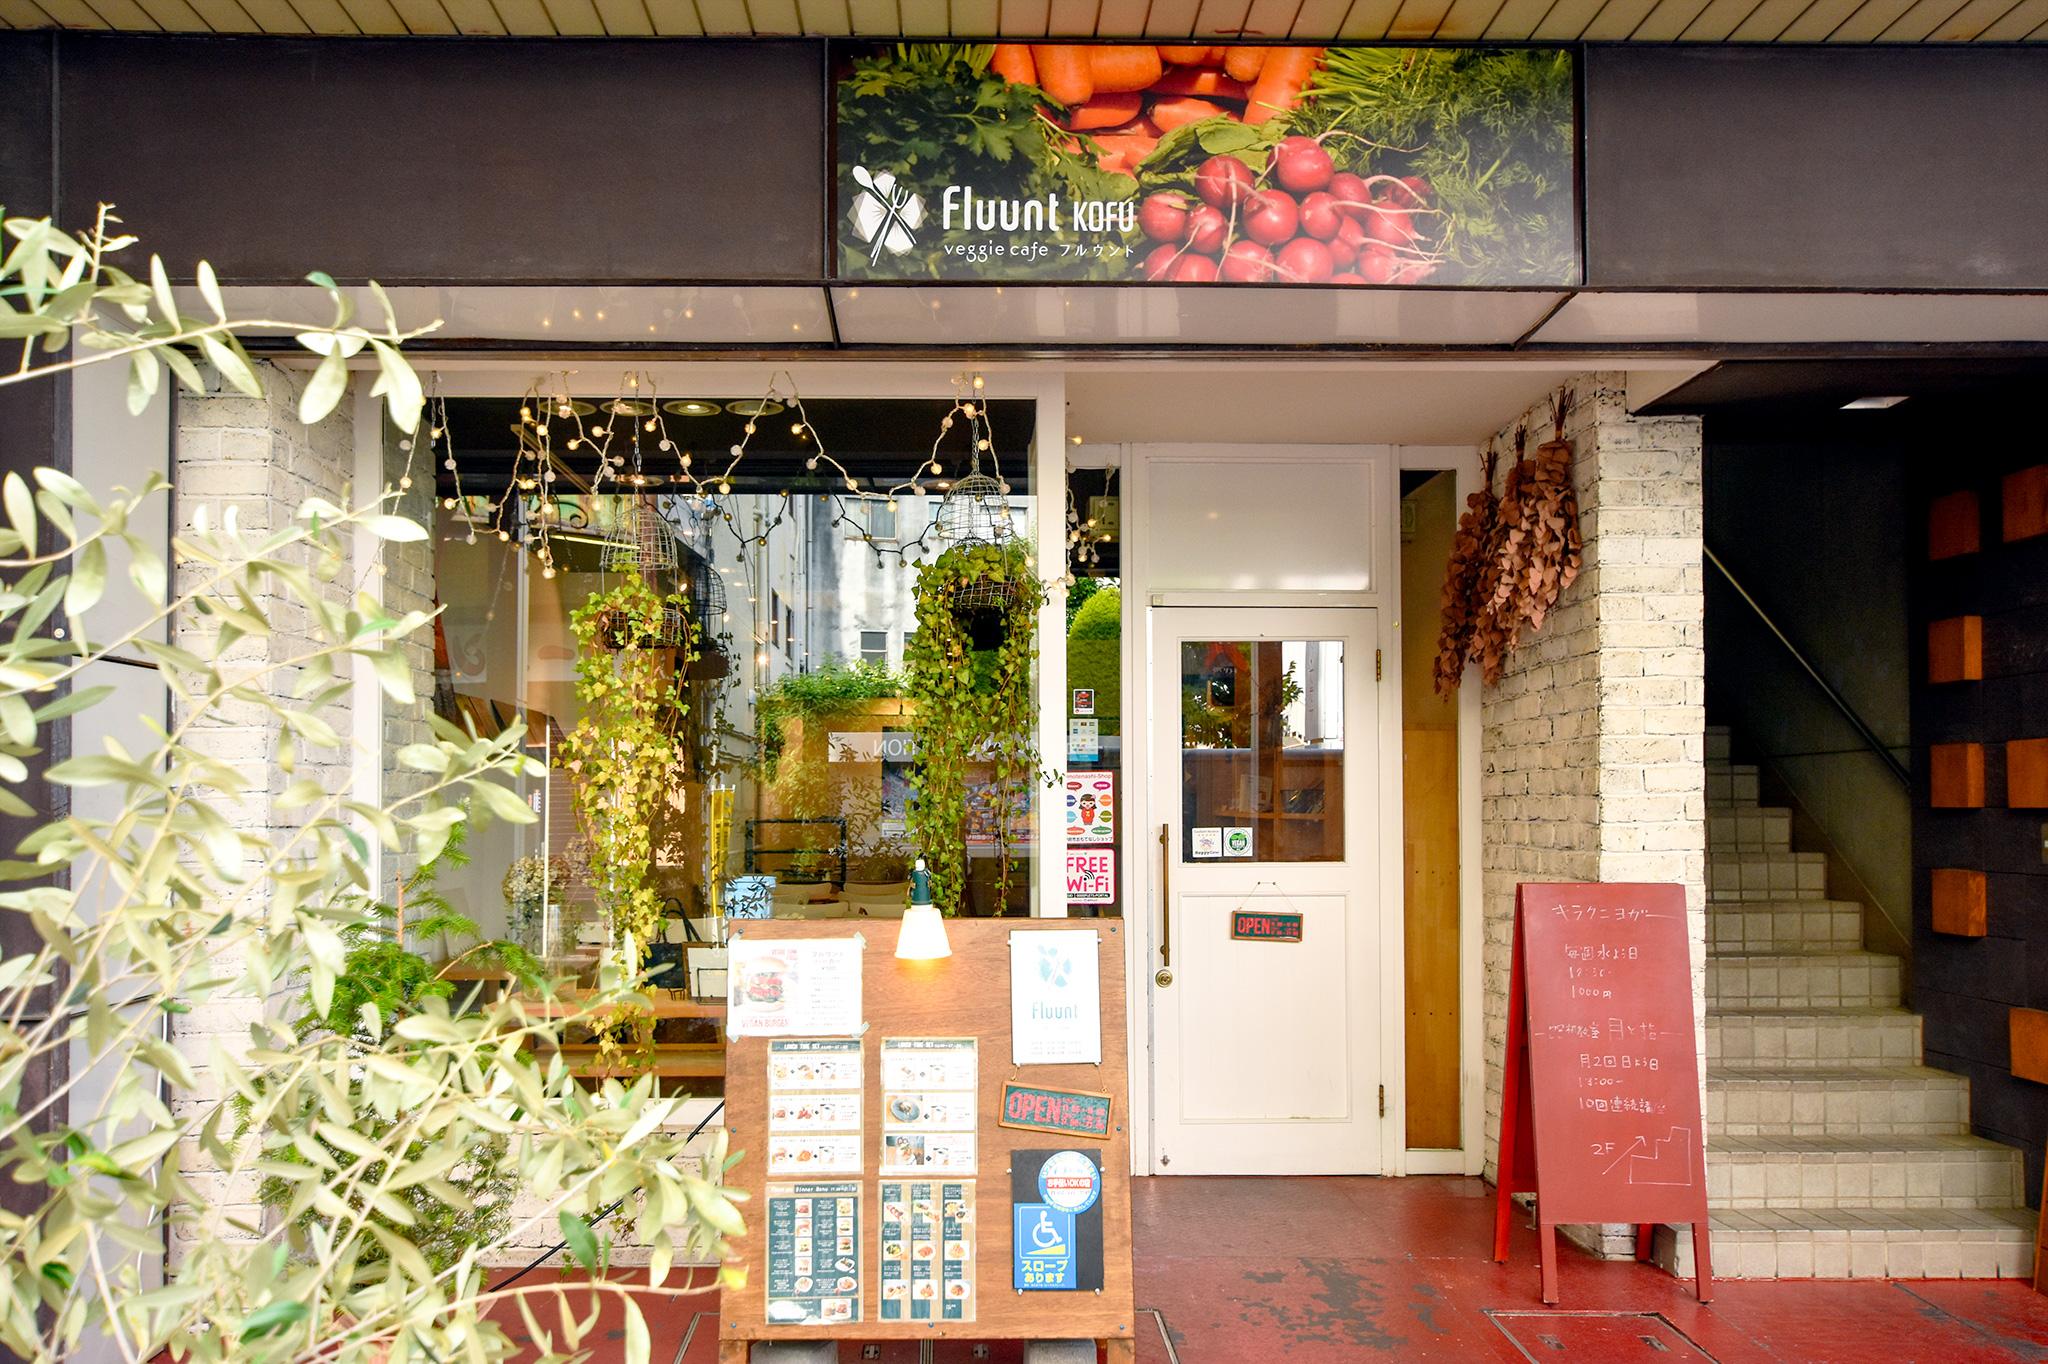 Fluunt KOFU フルウントコウフ 甲府市 洋食 カフェ オーガニック 5